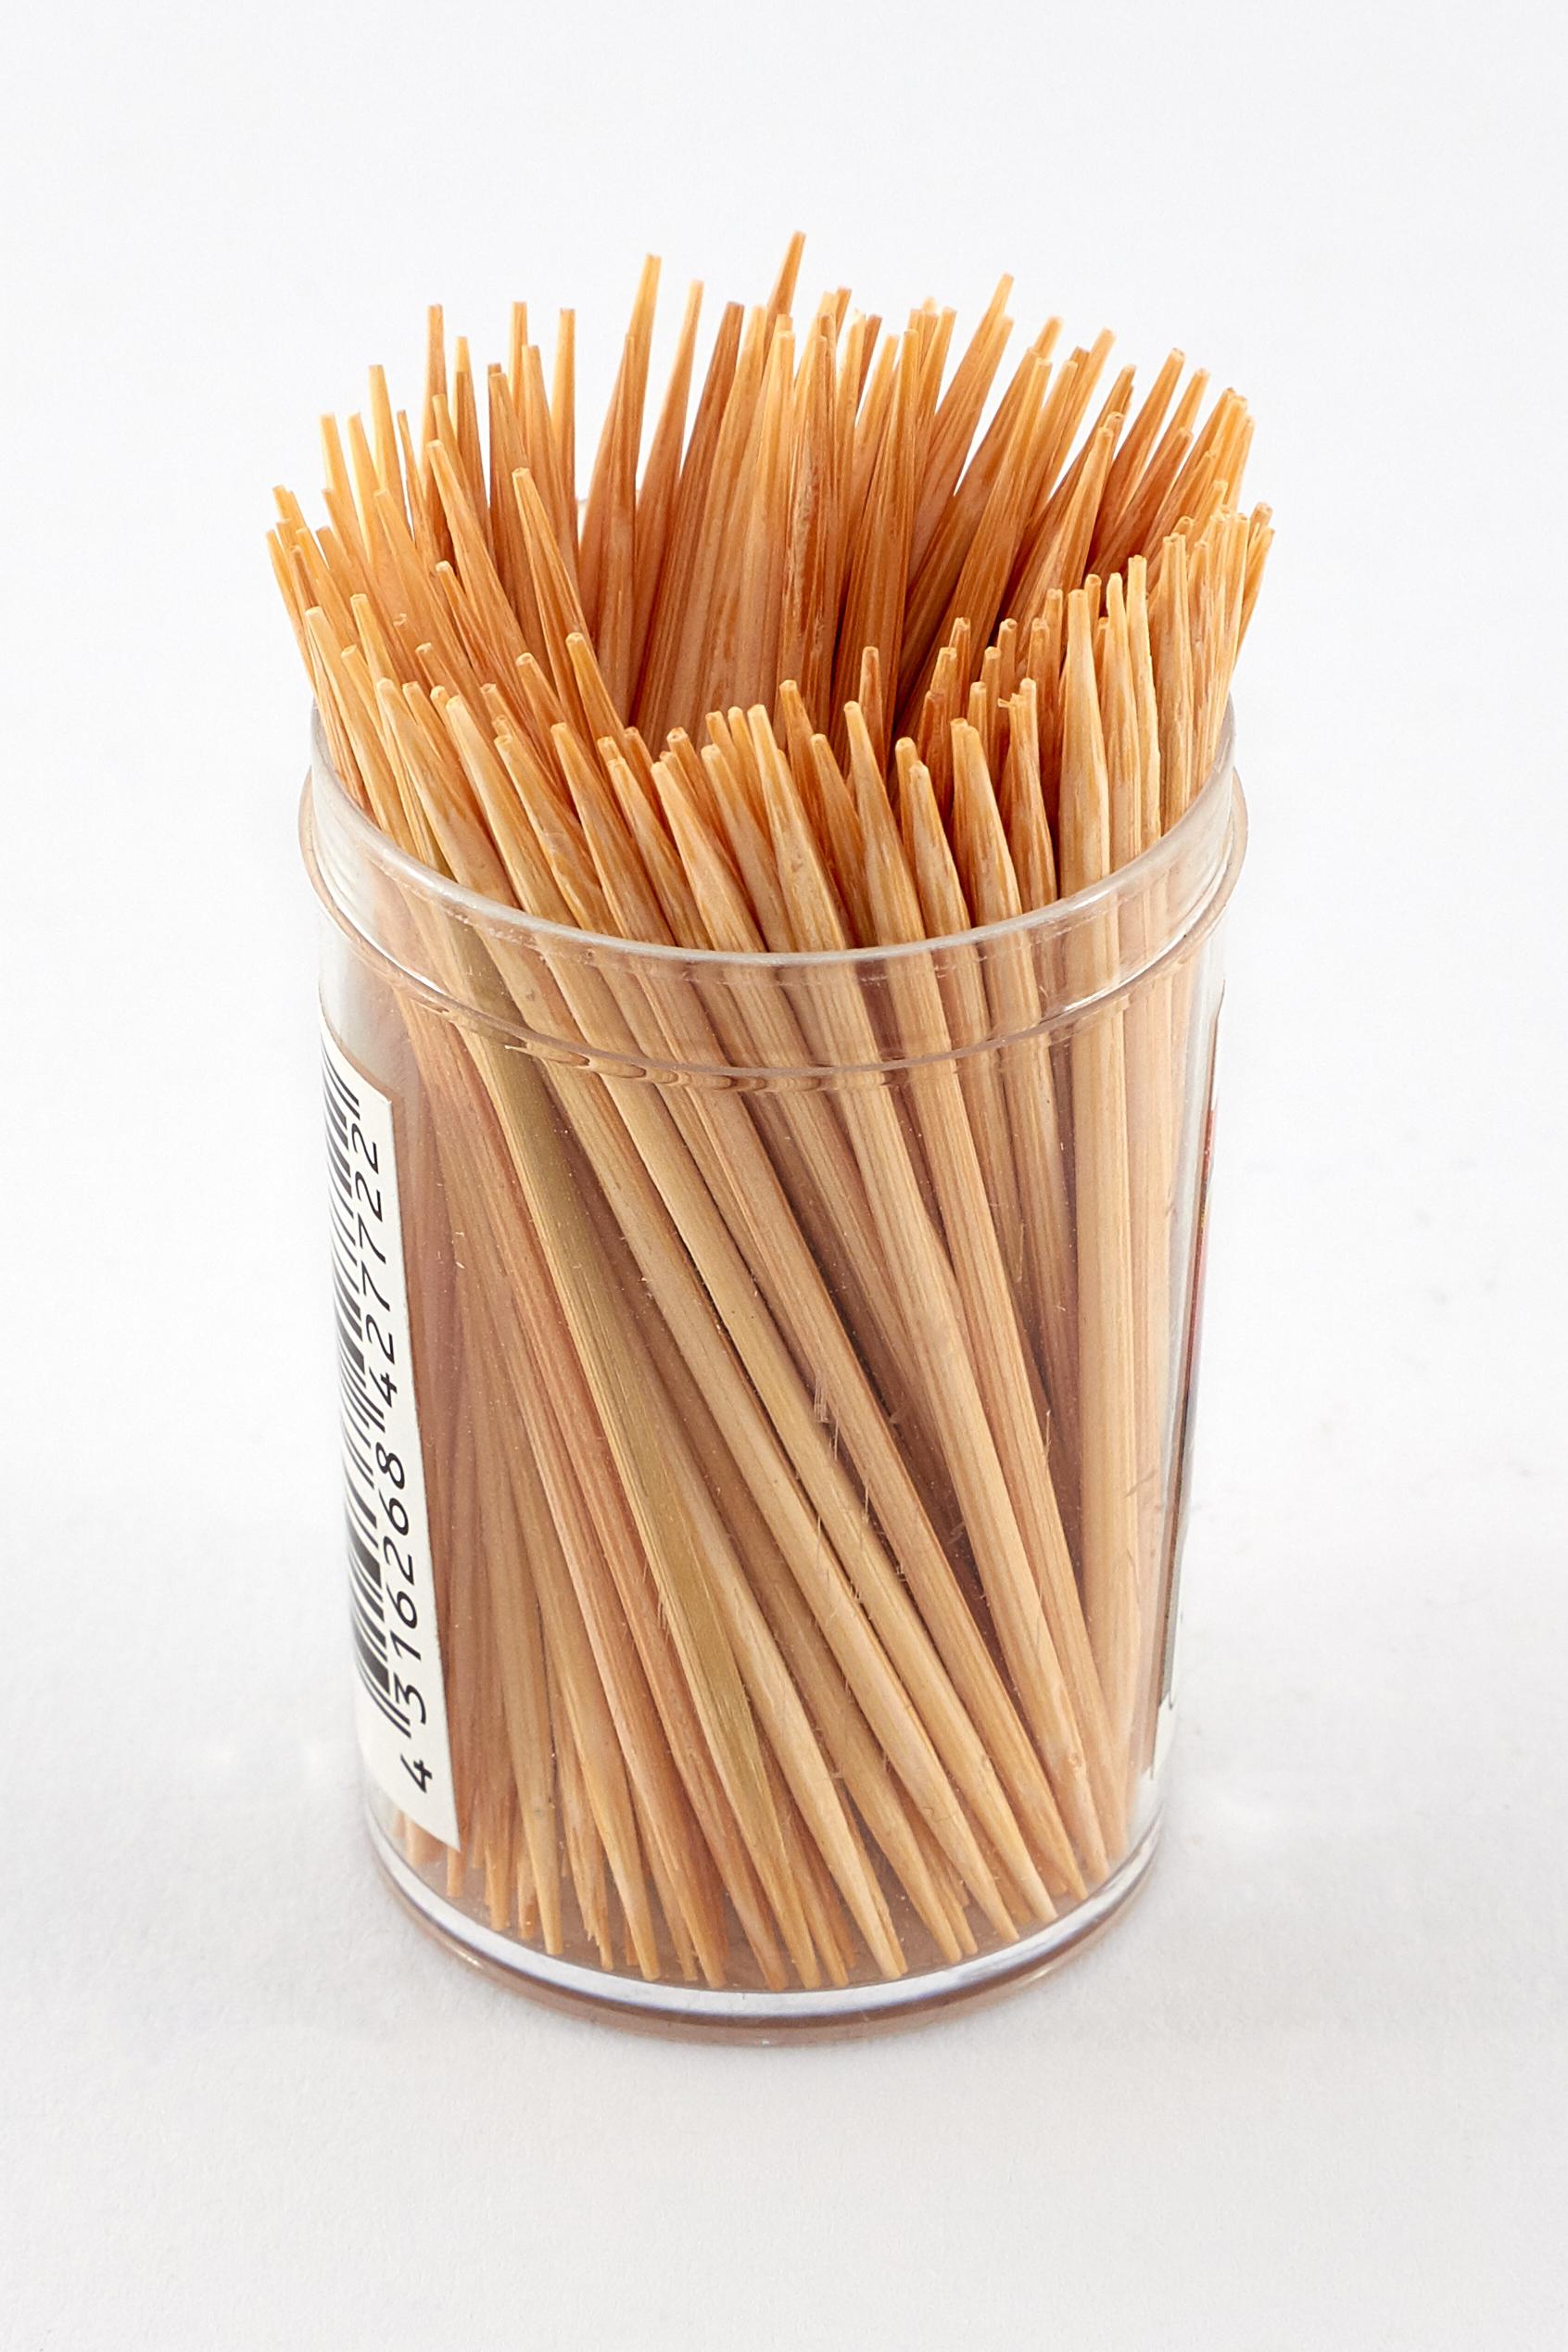 Do Cinnamon Sticks Work In Cold Drinks